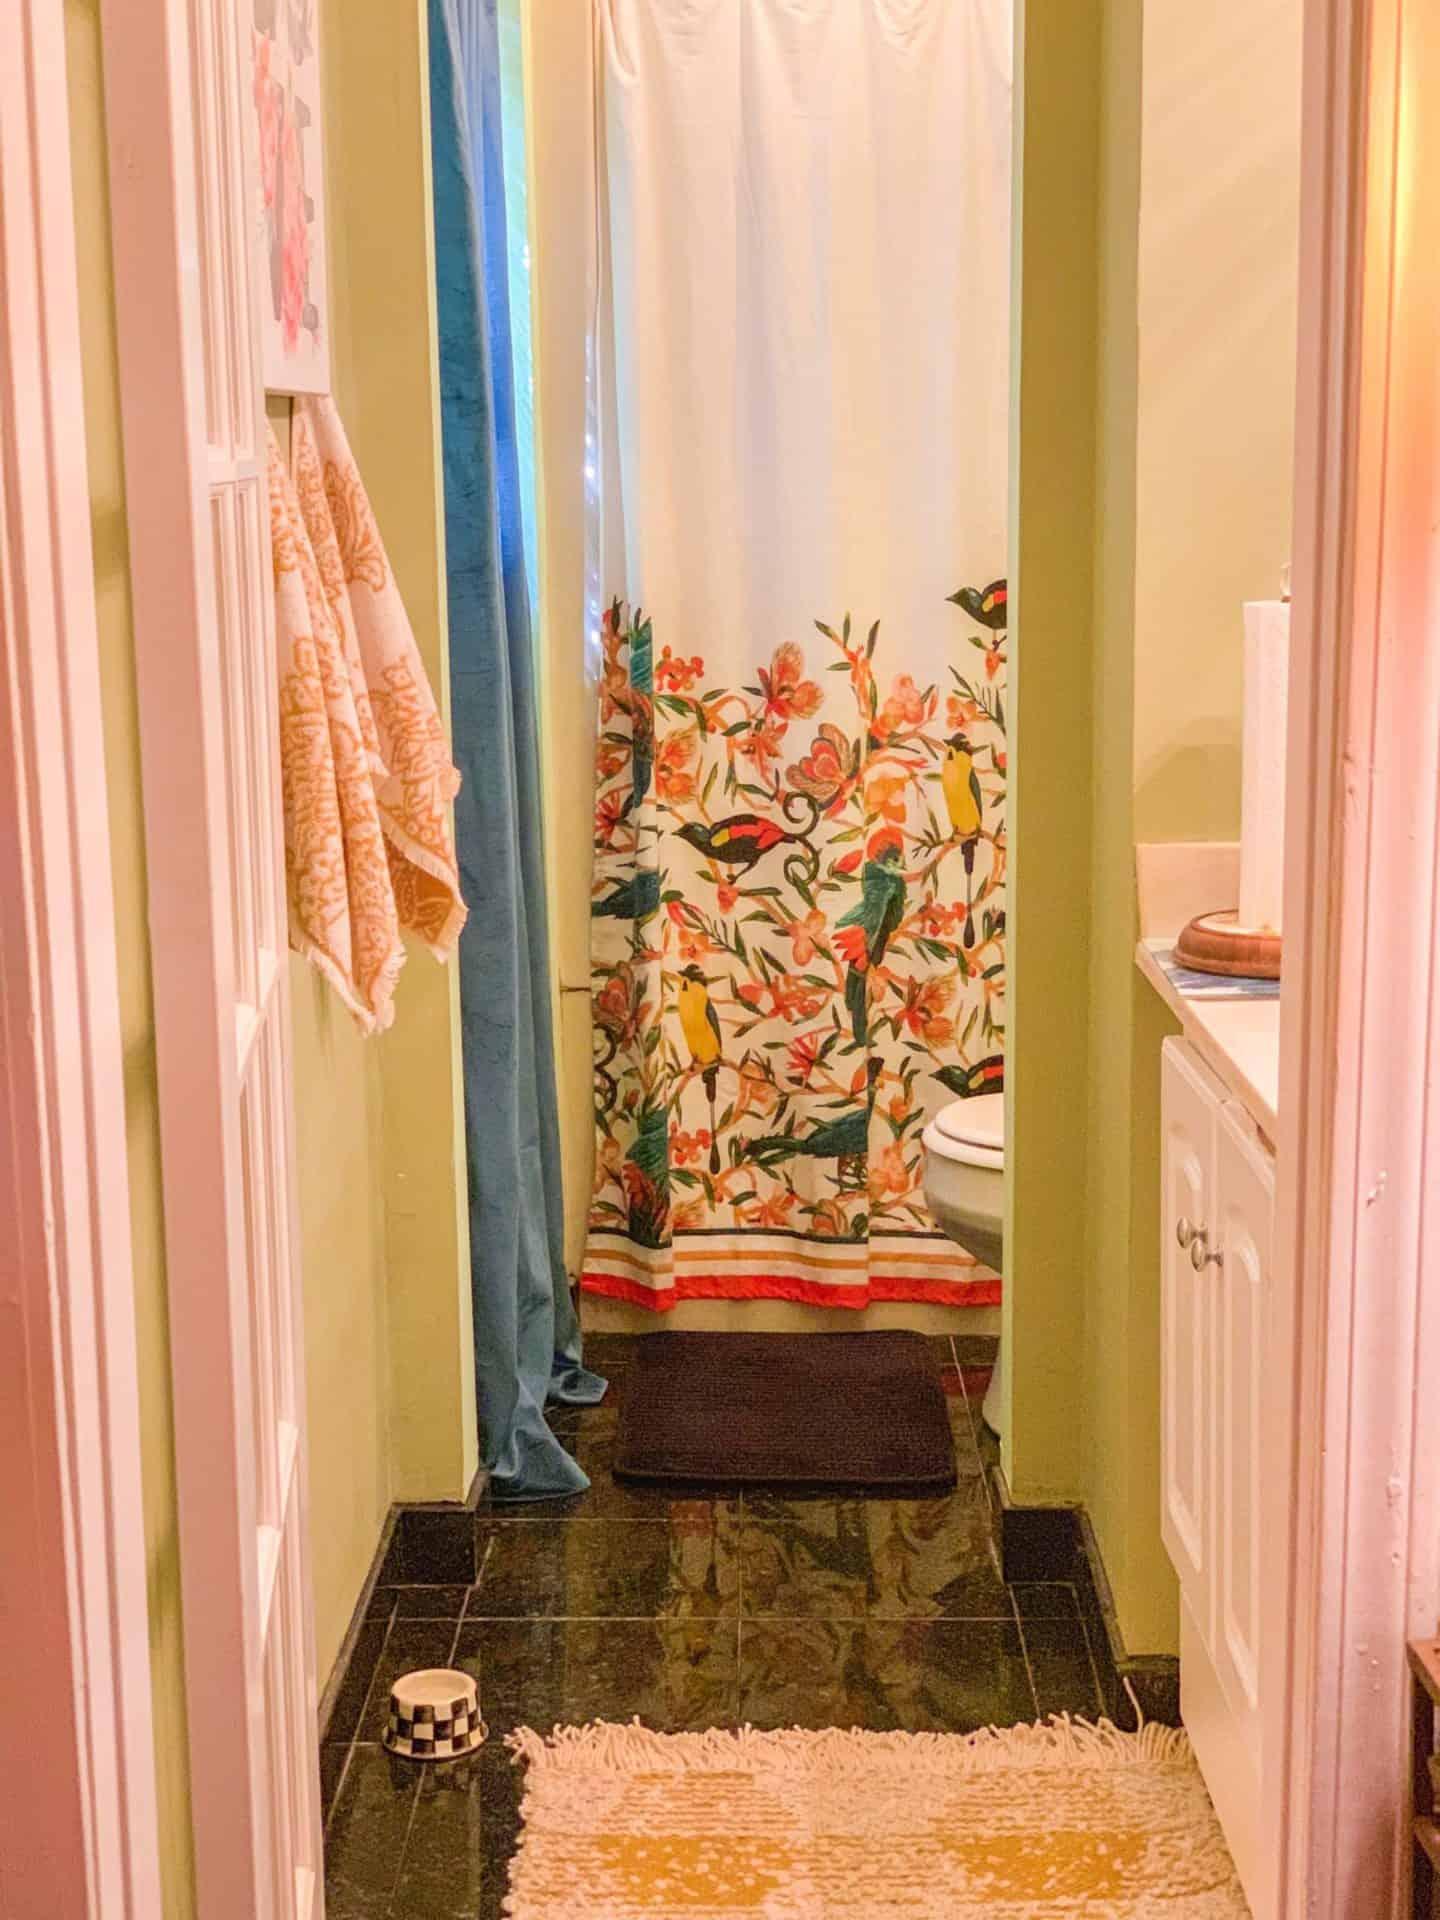 Shaunda Necole- Summer don't go! Saving the season with new bohemian bathroom decor